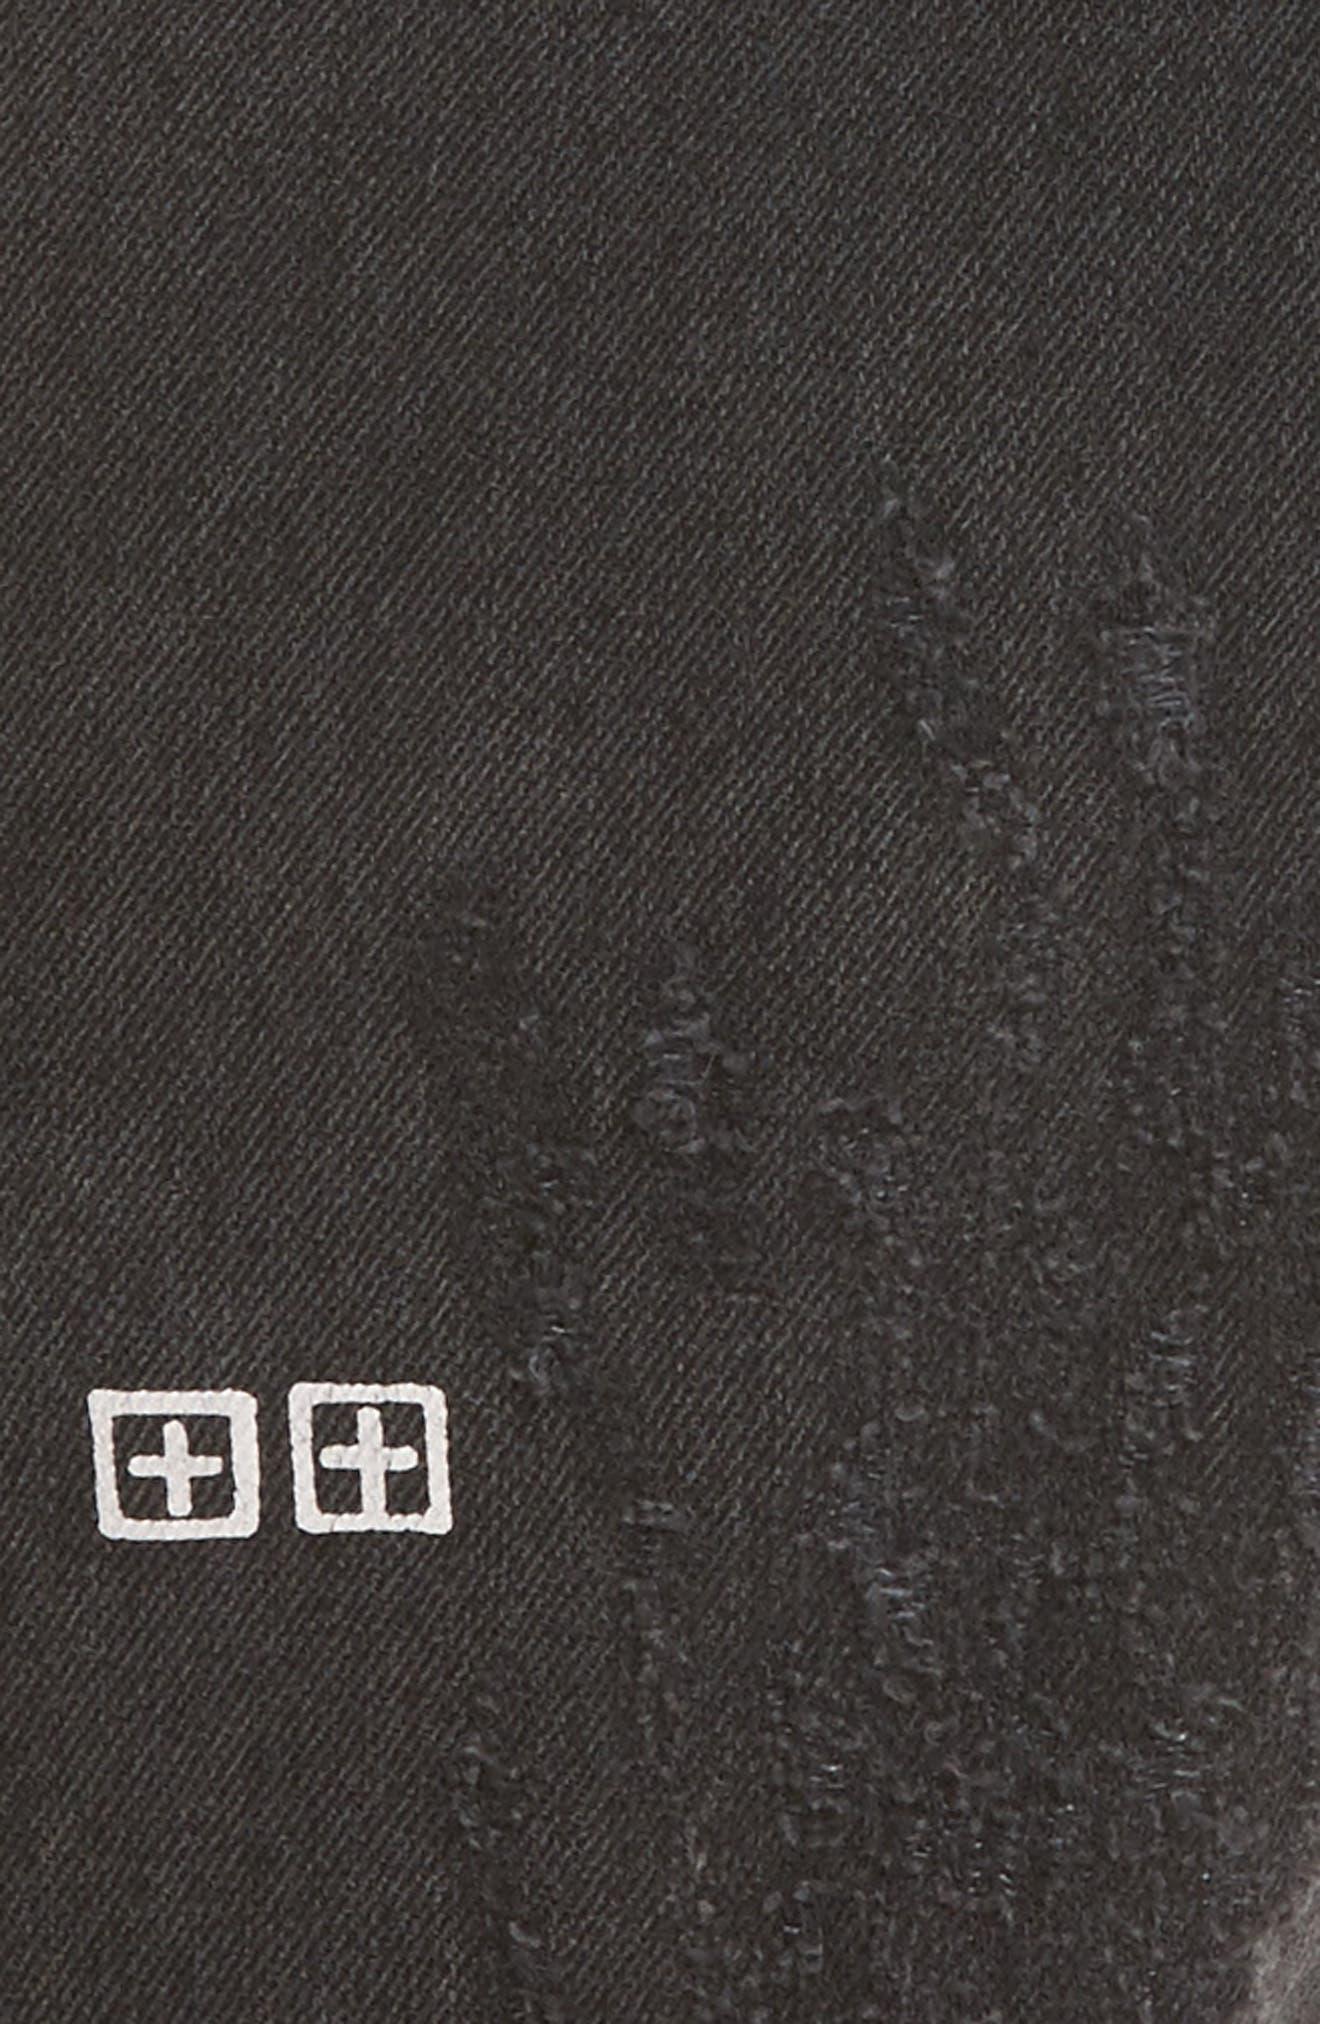 Chitch Chop Rat Attack Jeans,                             Alternate thumbnail 5, color,                             Black